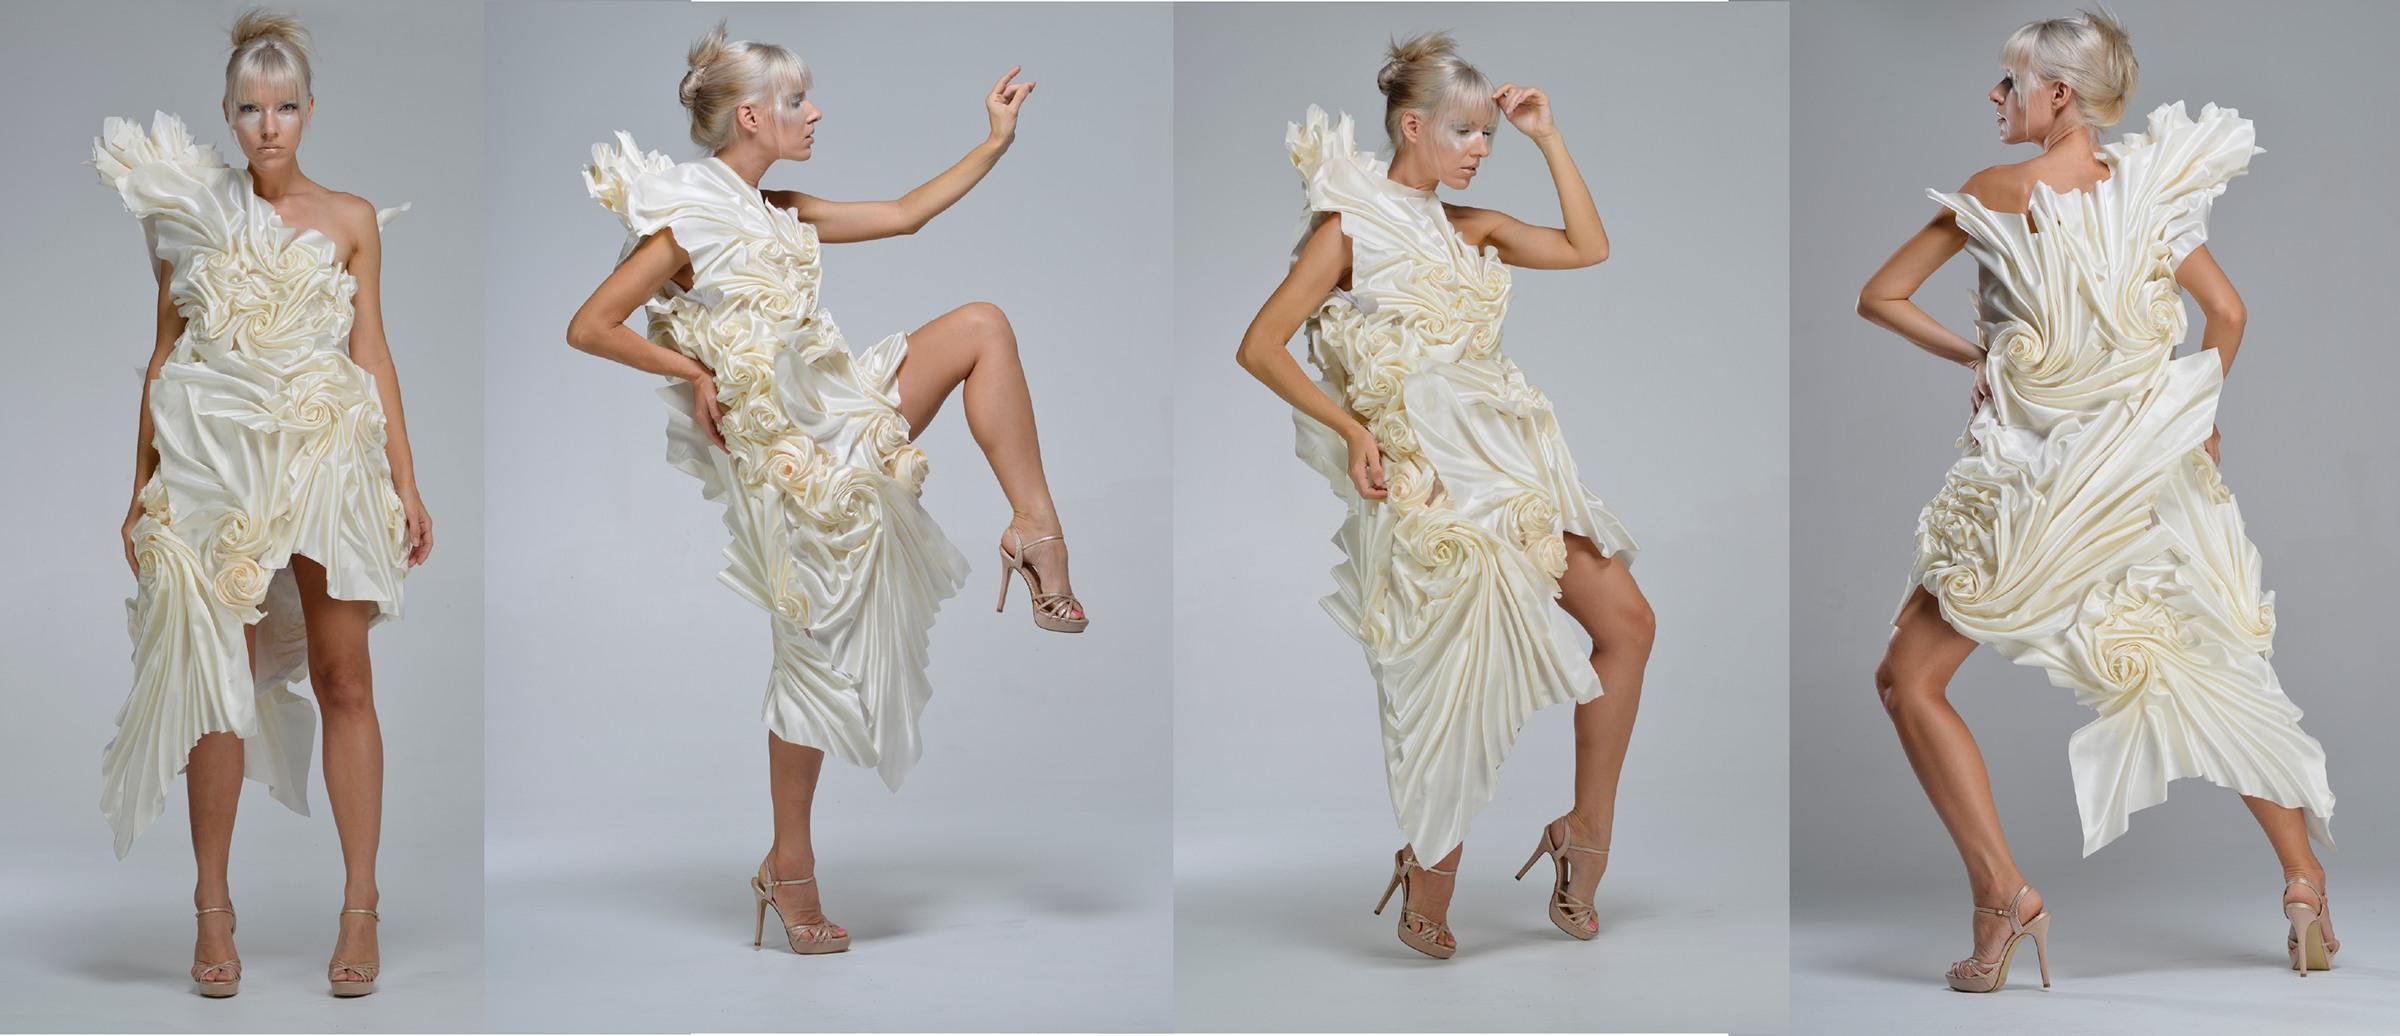 <div class='title'>           swirl dress 4 pic collage 01         </div>